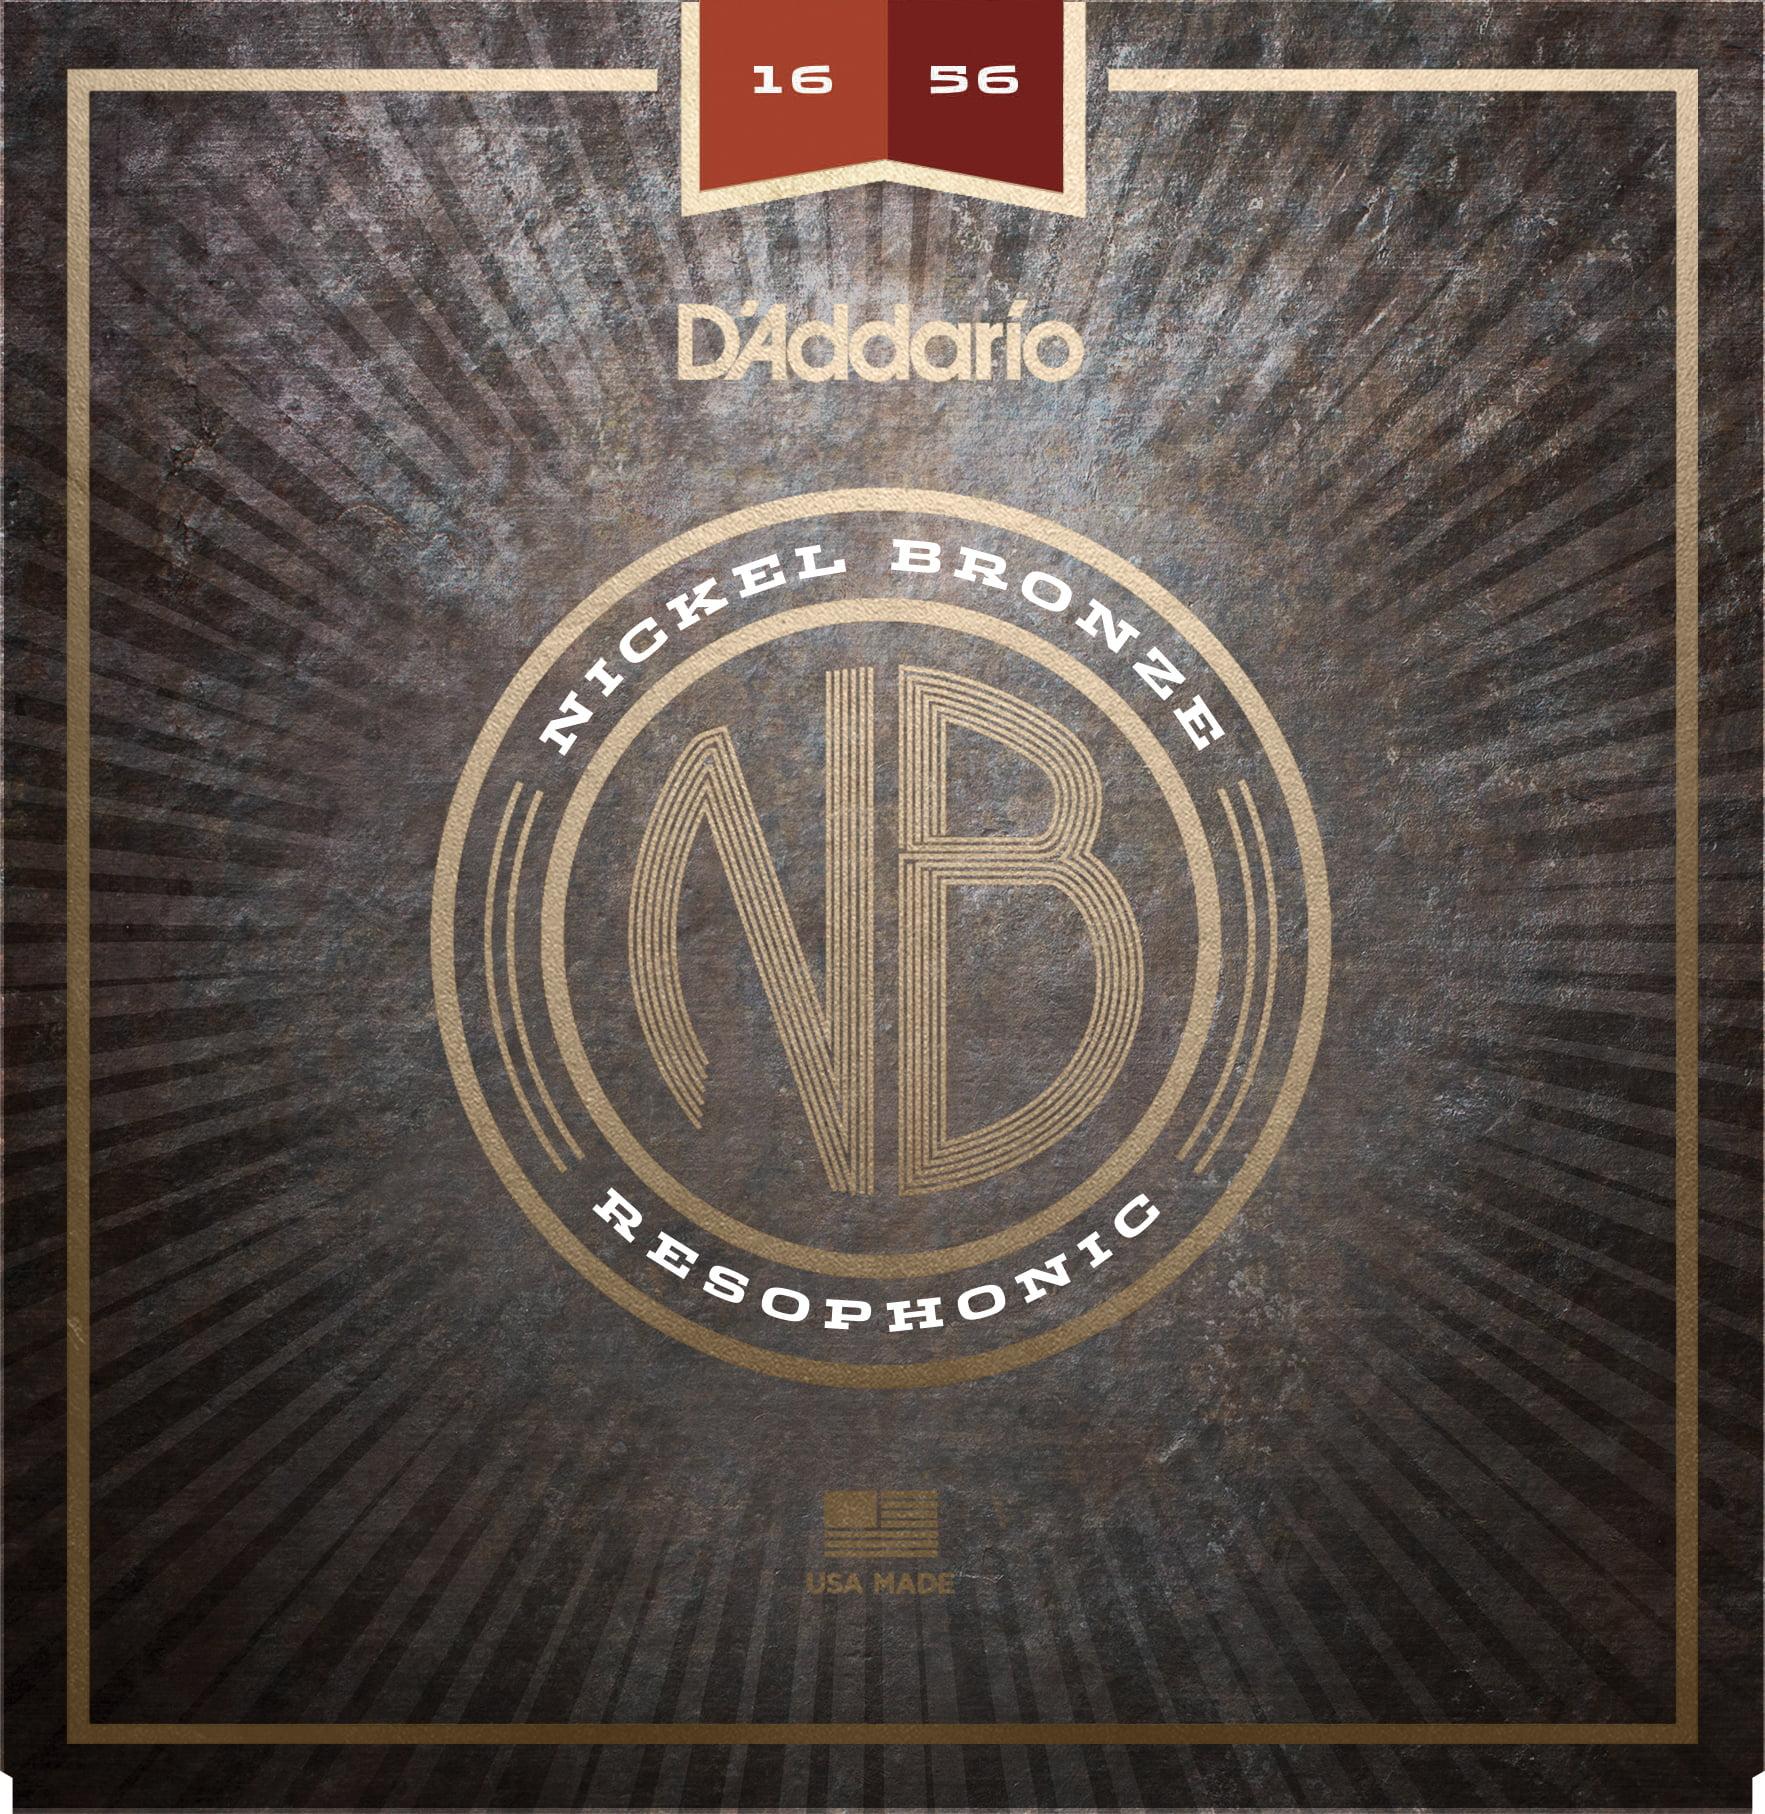 D'Addario NB1656 Nickel Bronze Acoustic Guitar Strings, Resophonic, 16-56 by D'Addario